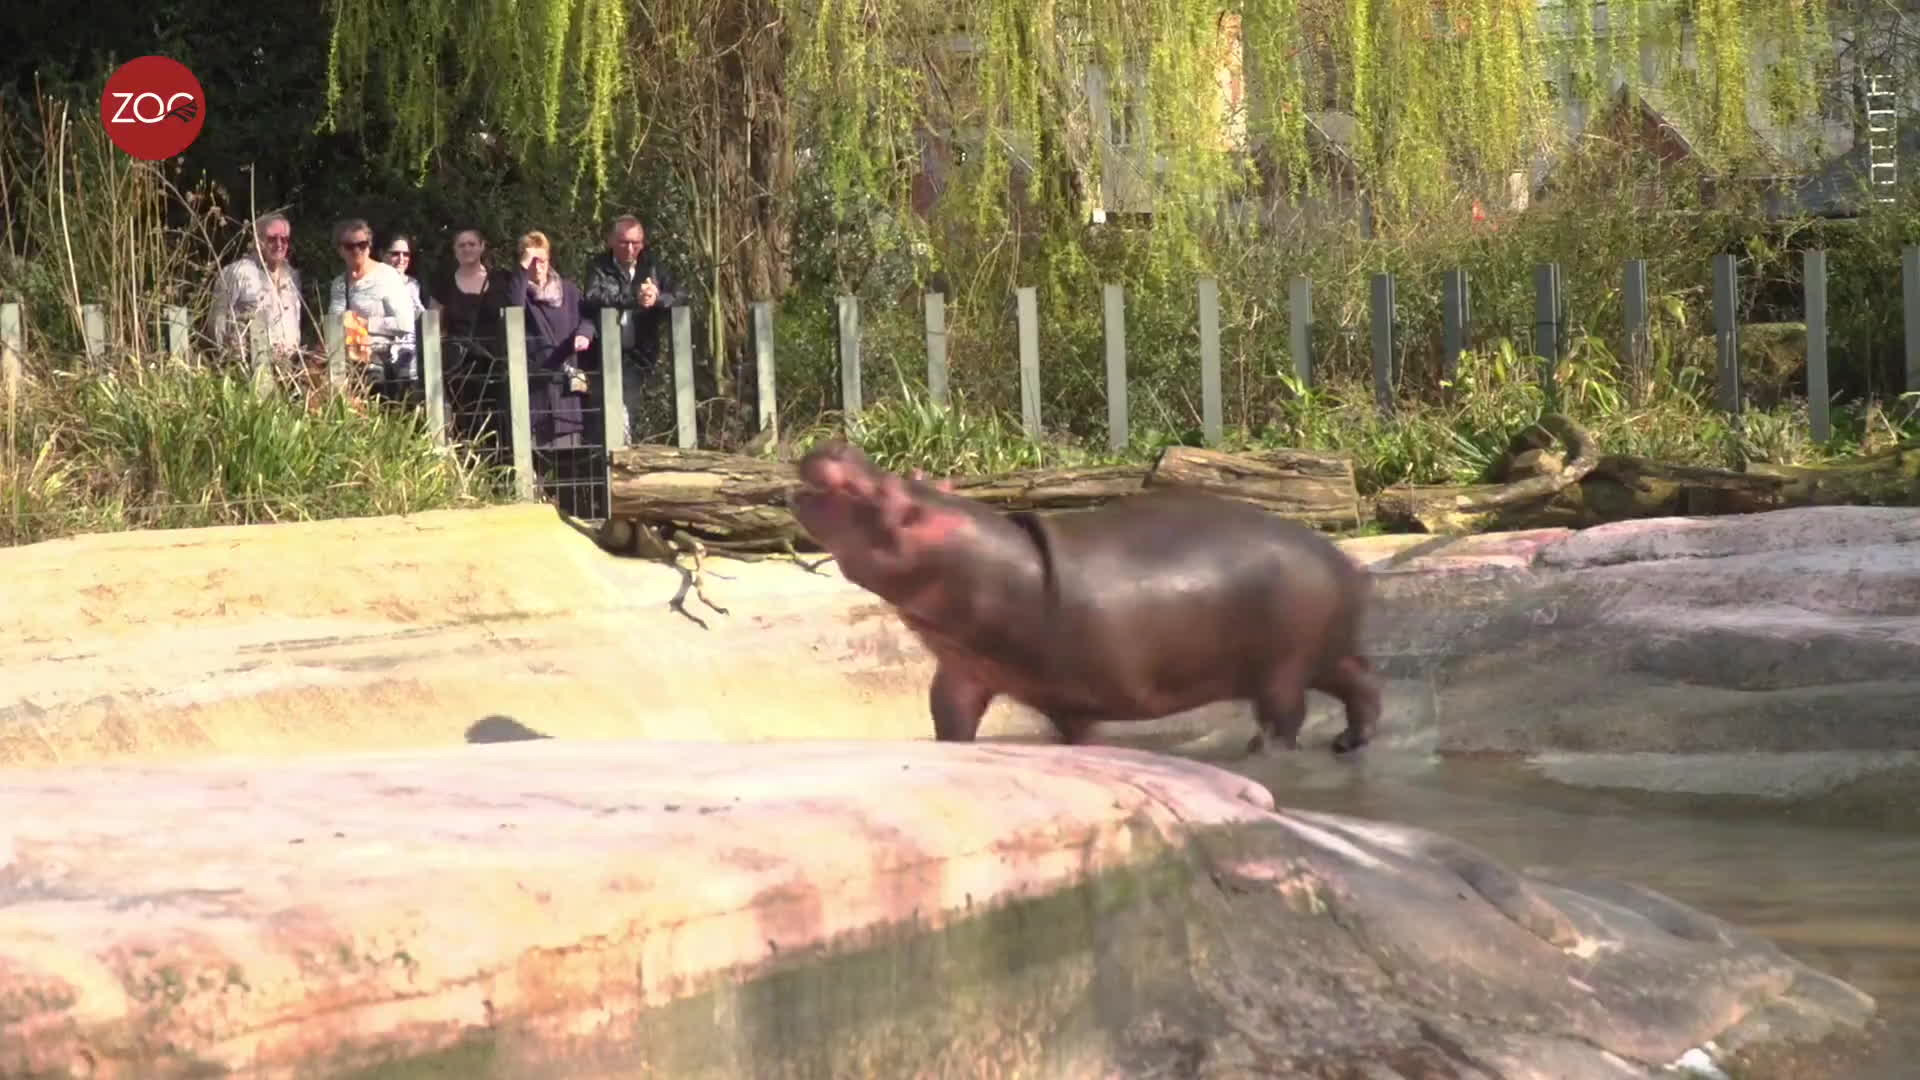 antwerp zoo, nijlpaard, zoo antwerpen, on my way! GIFs